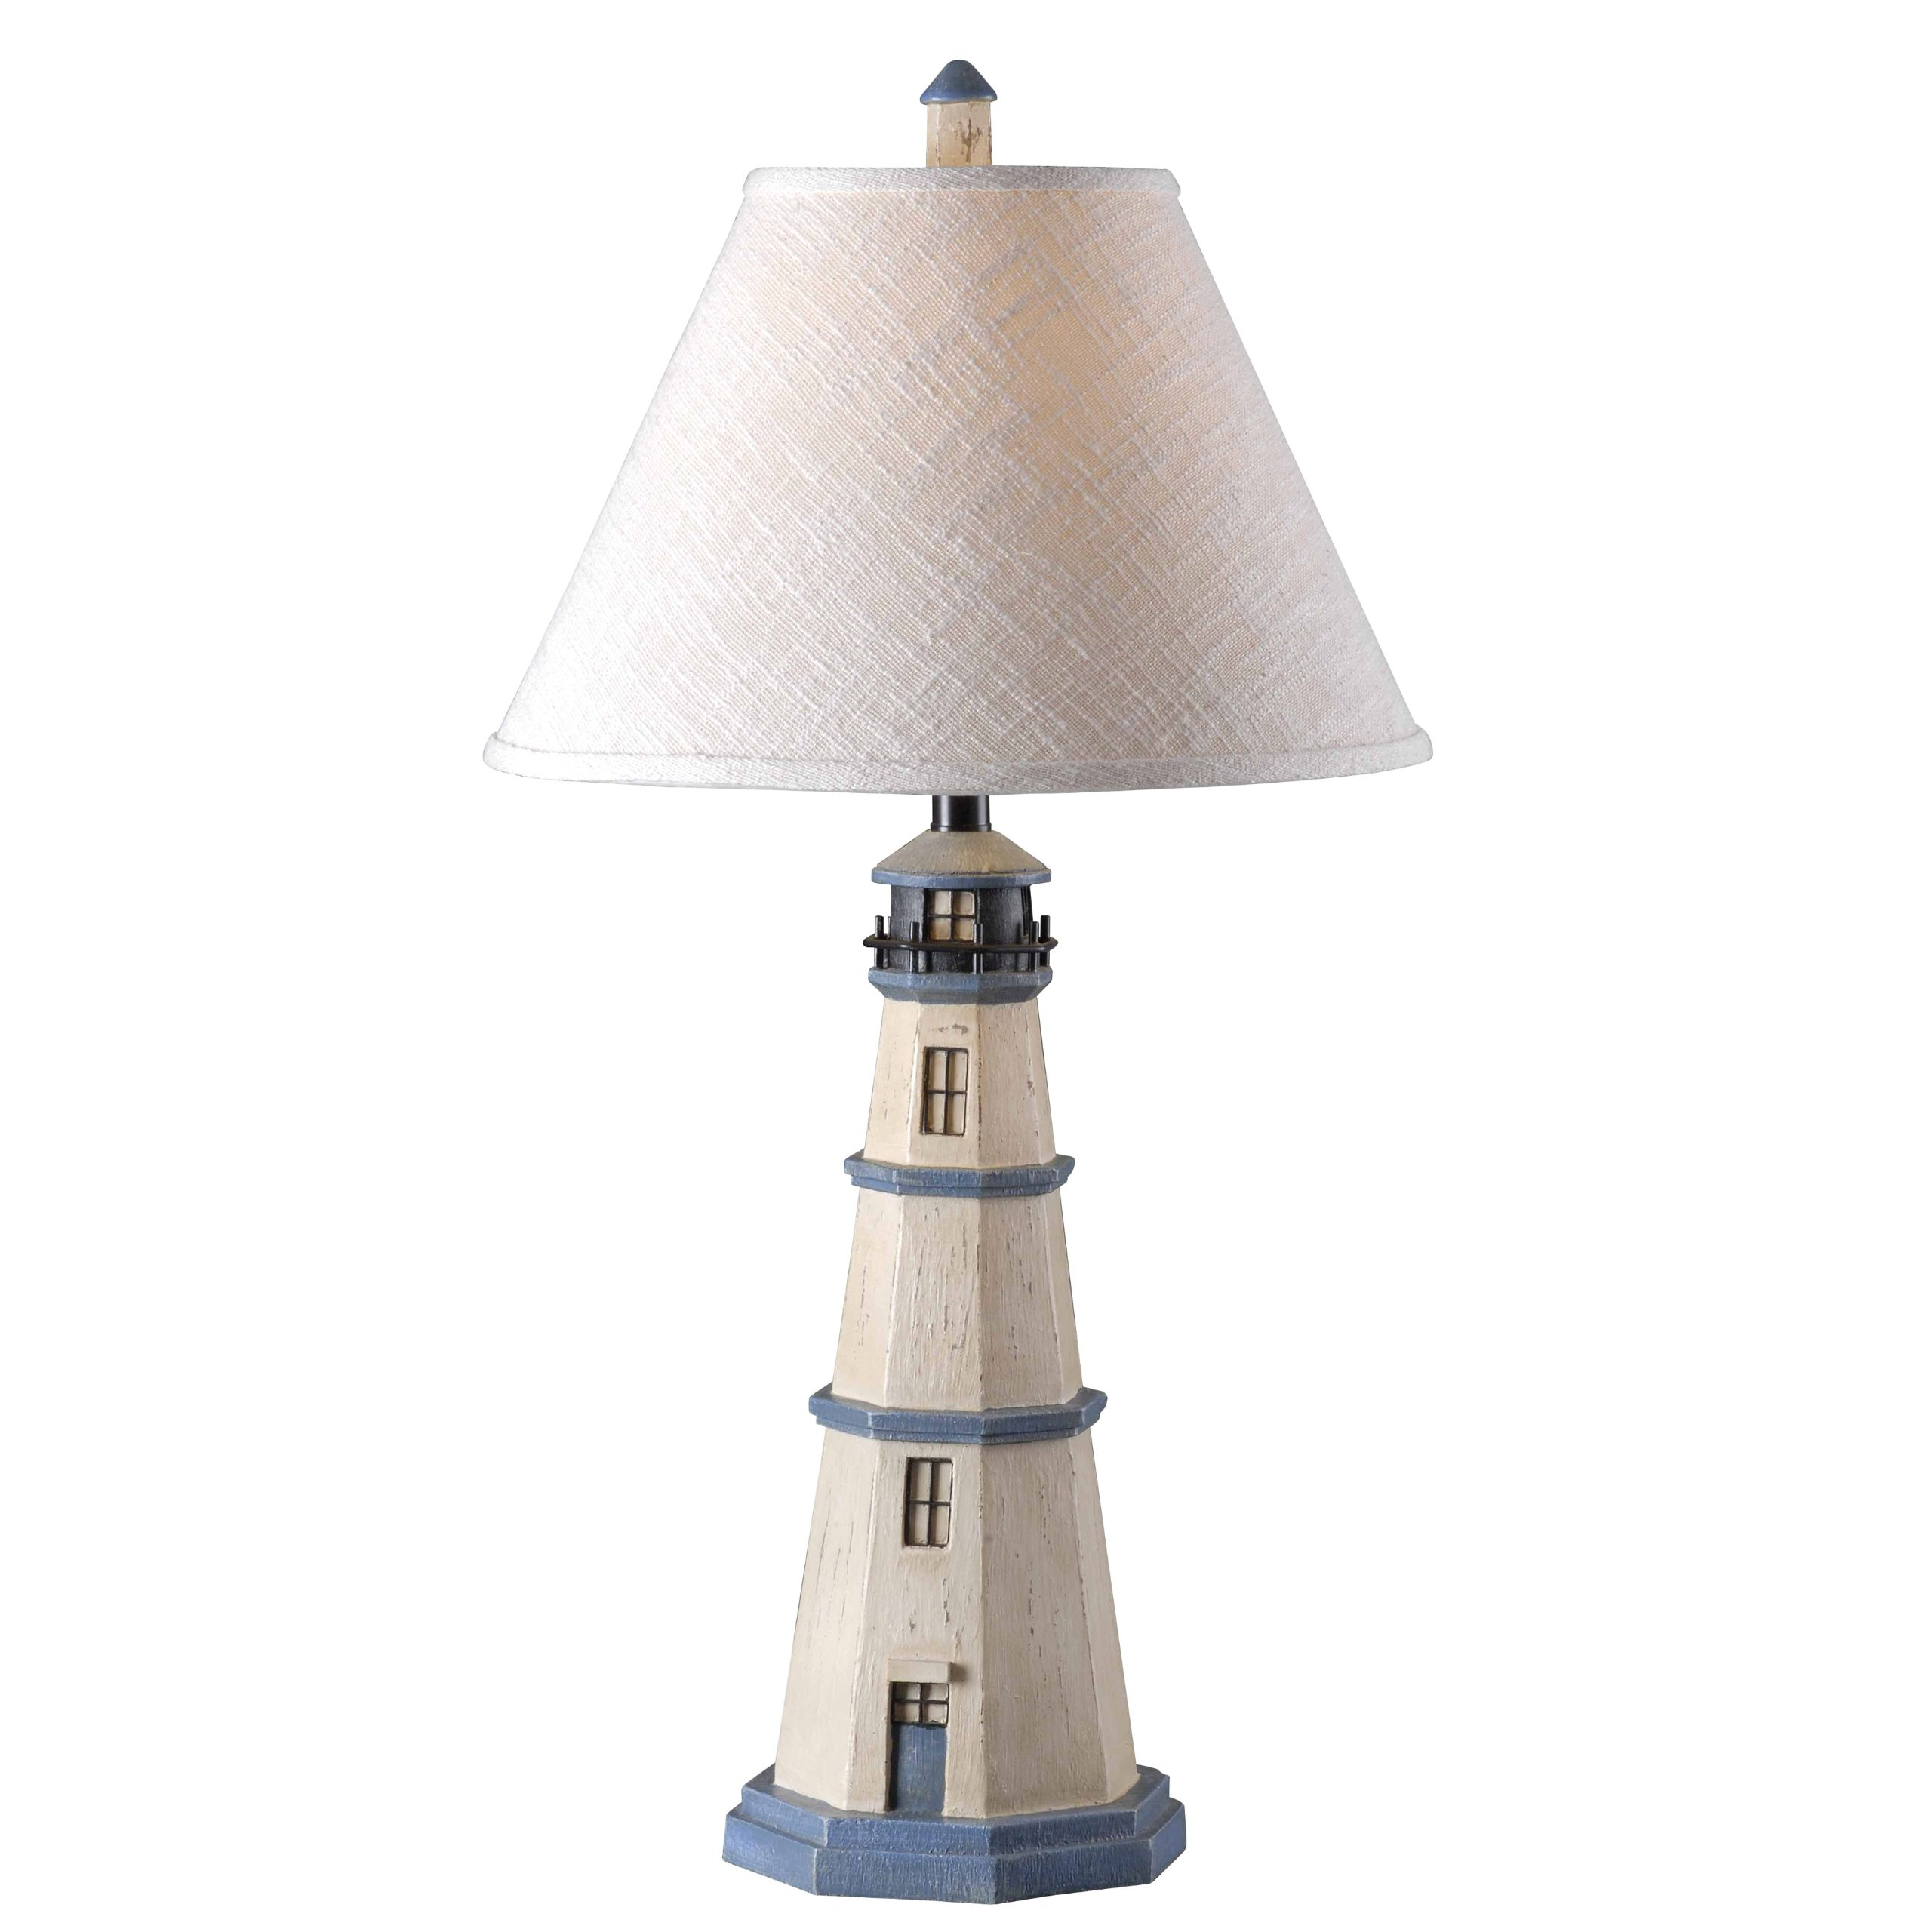 Kenroy Home 20140AW Nantucket Table Lamp, Antique White